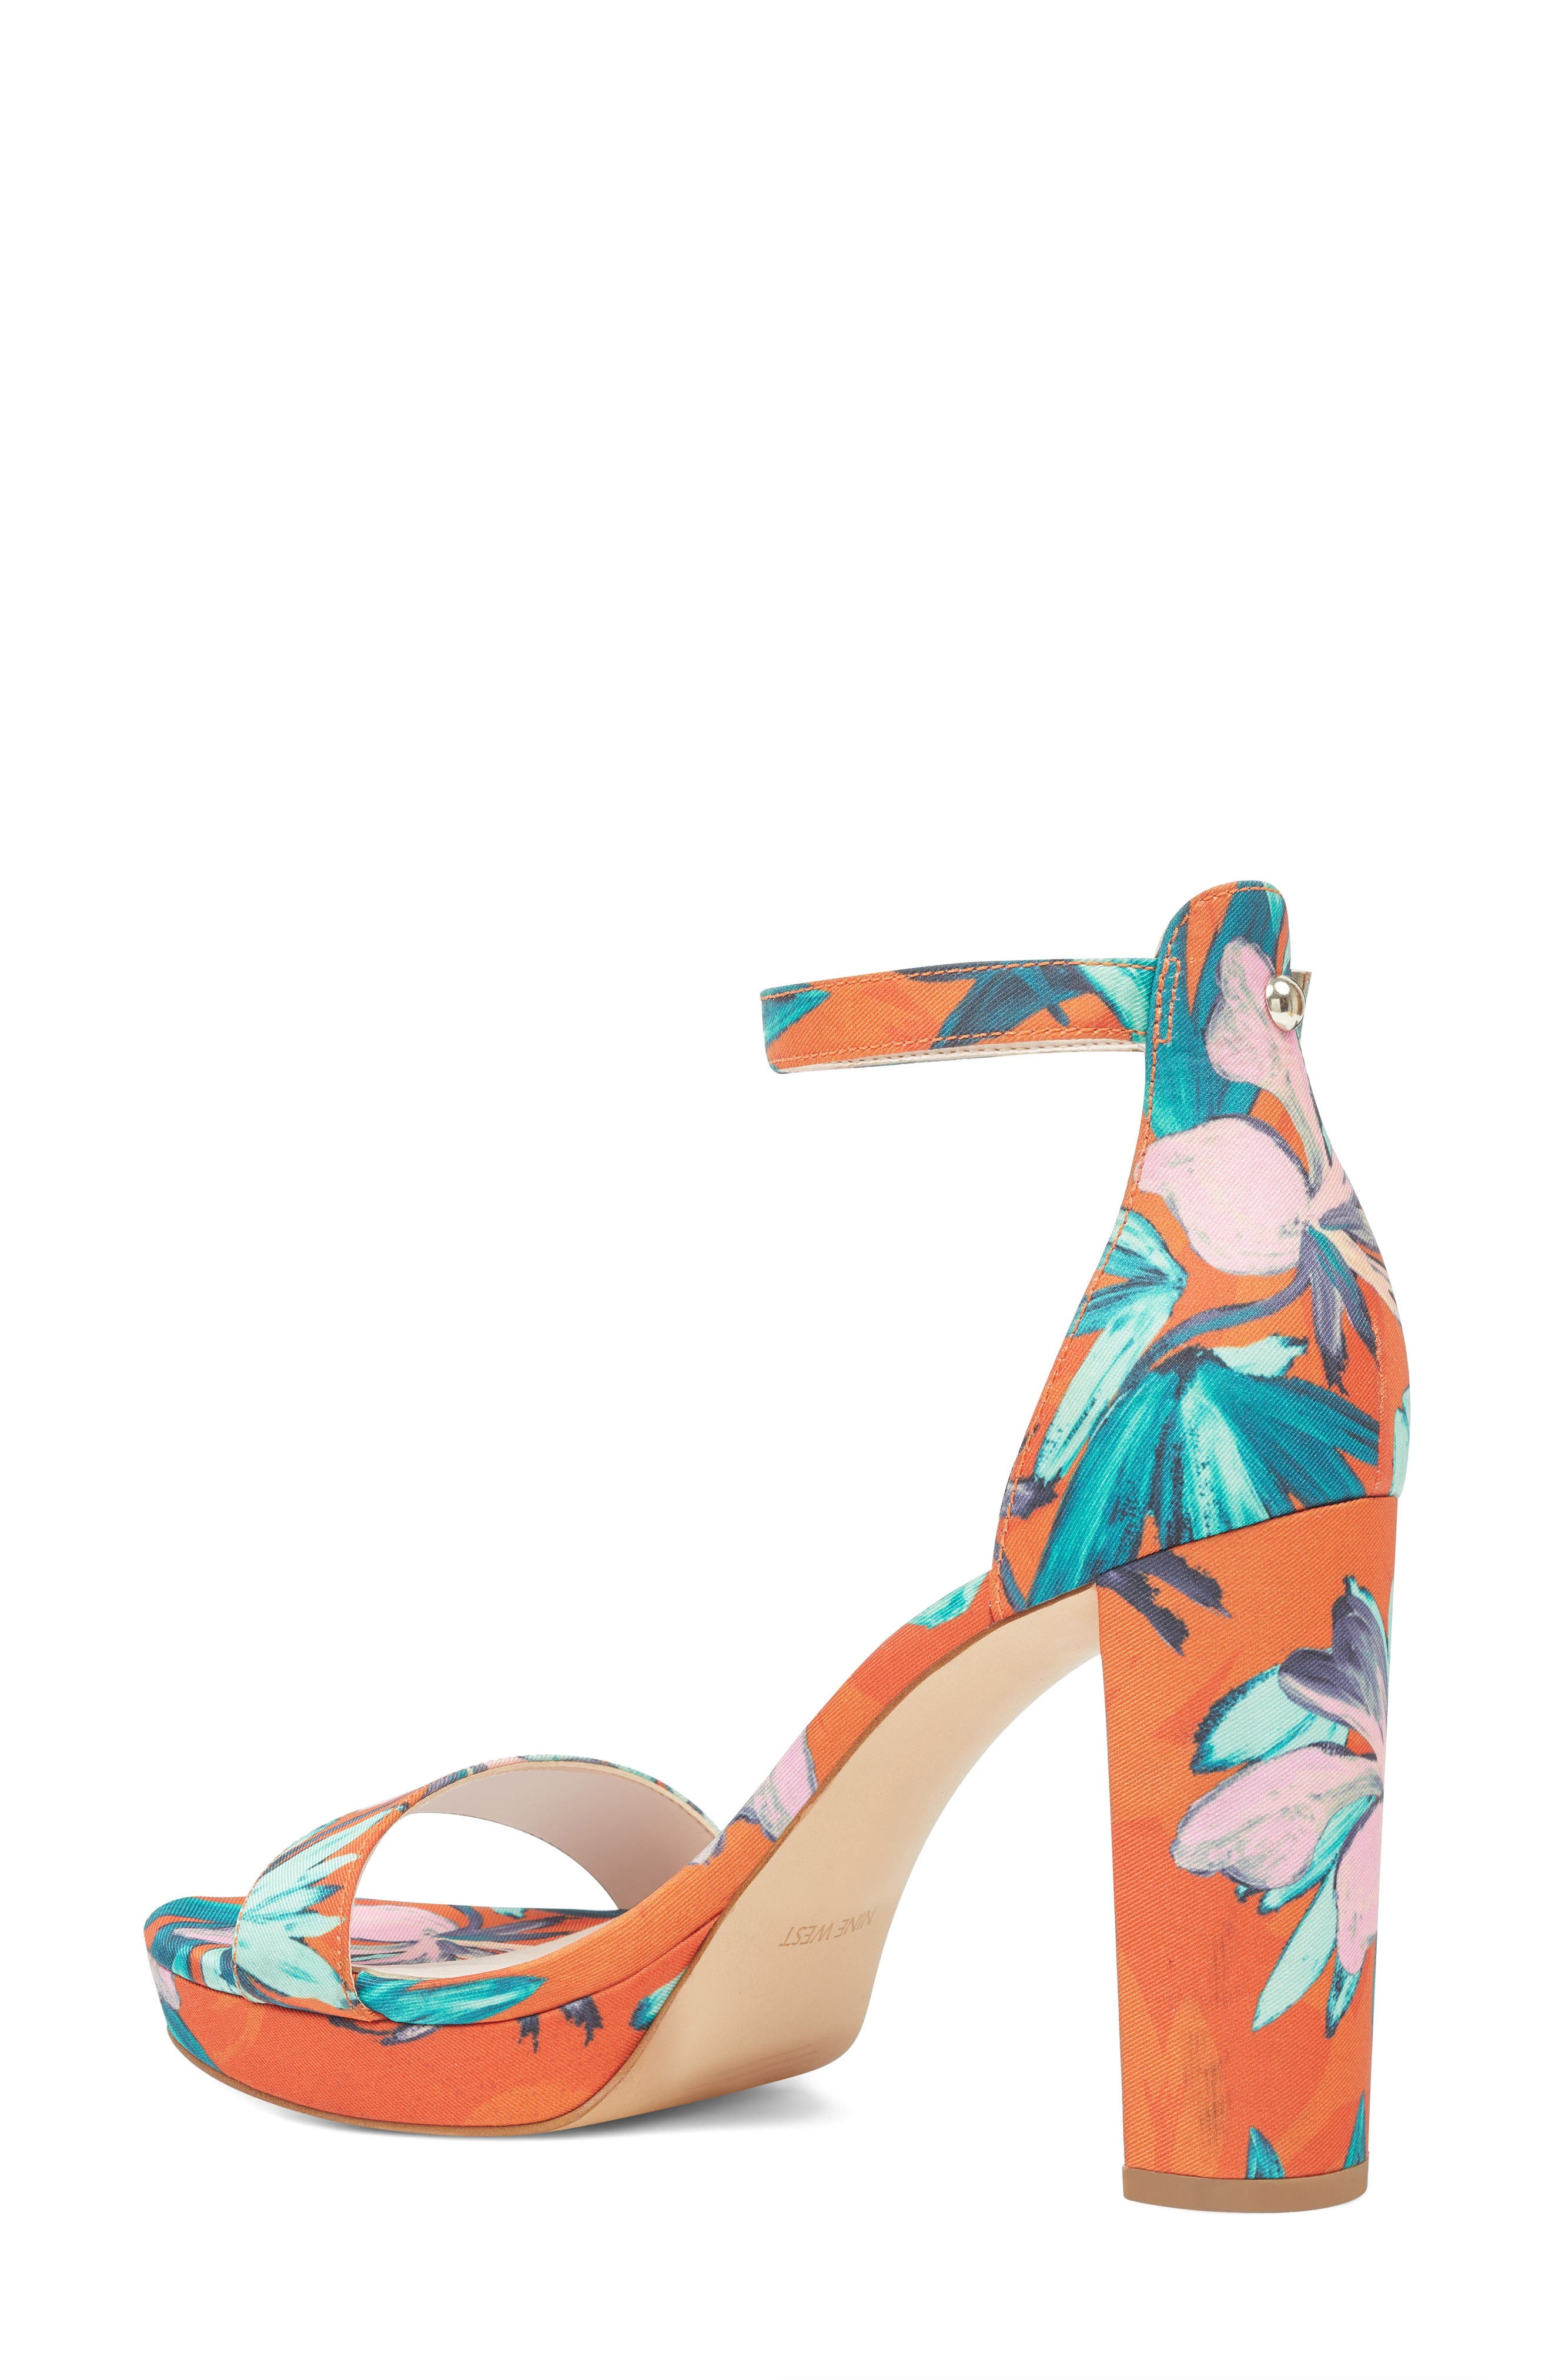 Dempsey Platform Sandal,                             Alternate thumbnail 2, color,                             ORANGE MULTI FABRIC